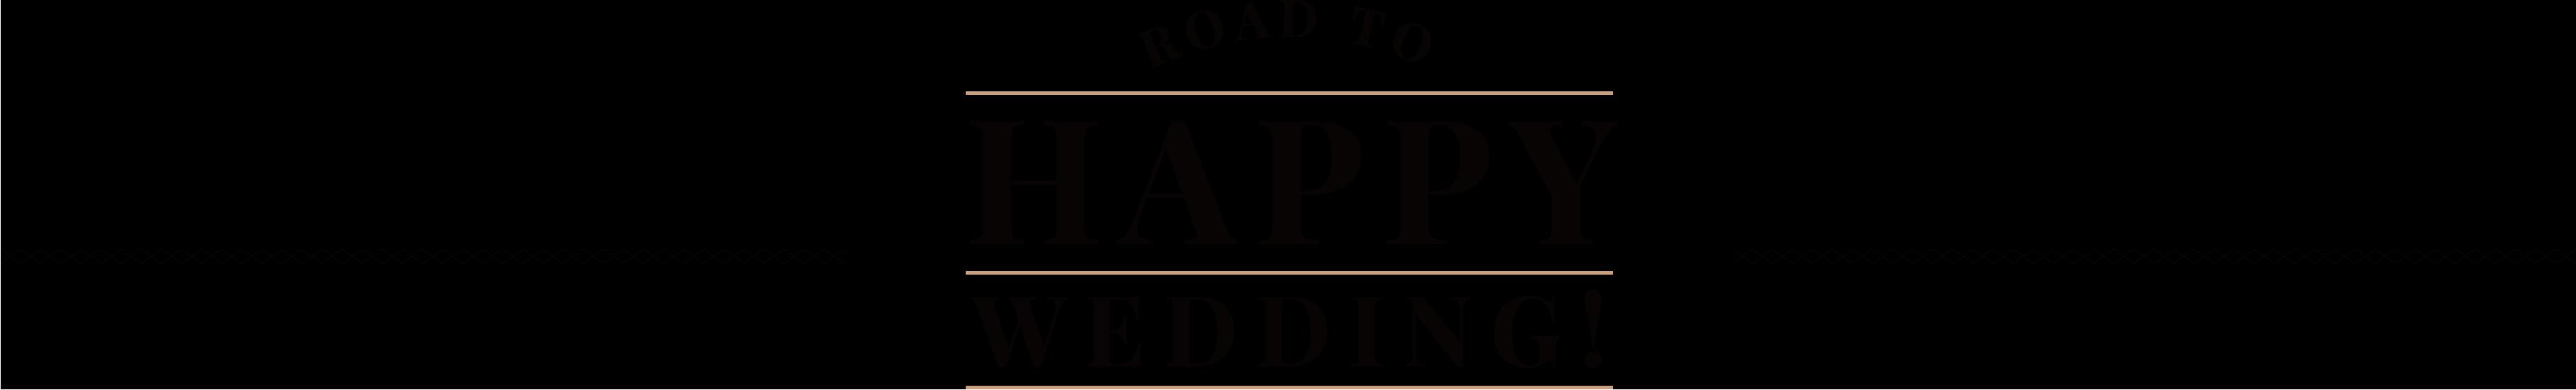 ROAD TO HAPPY WEDDING!